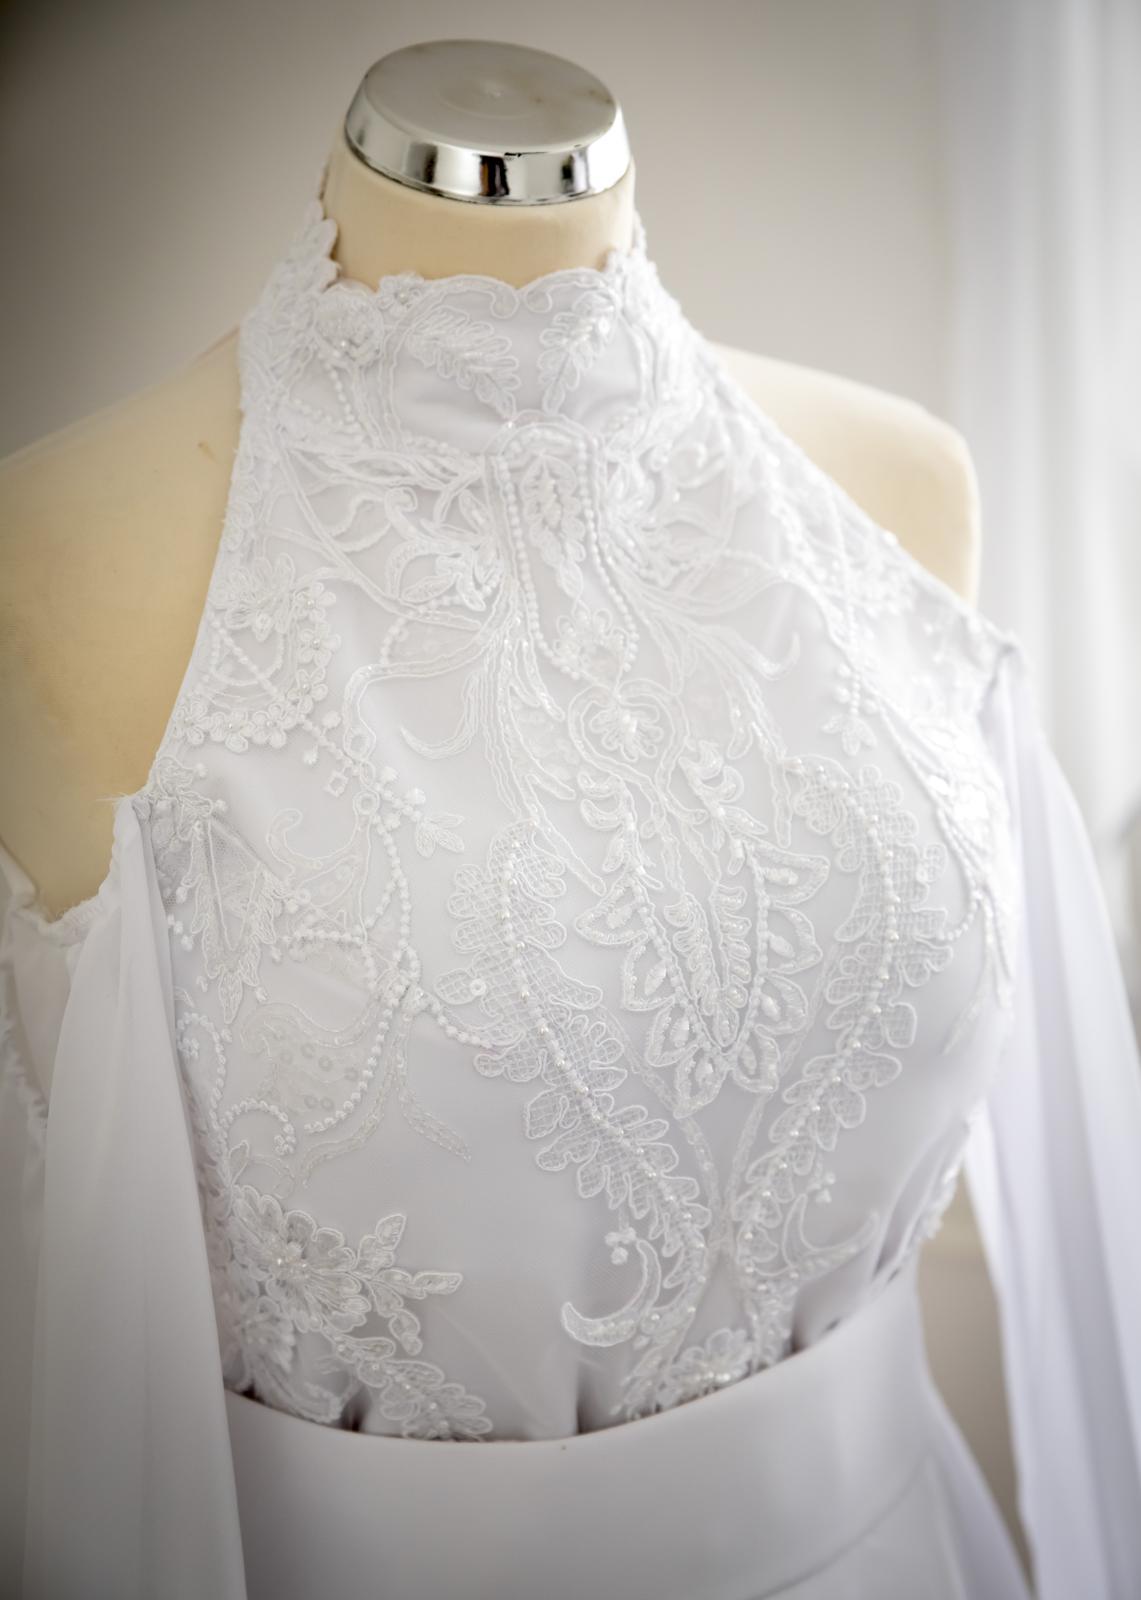 Svadobné šaty s vlečkou 2019 - Obrázok č. 2